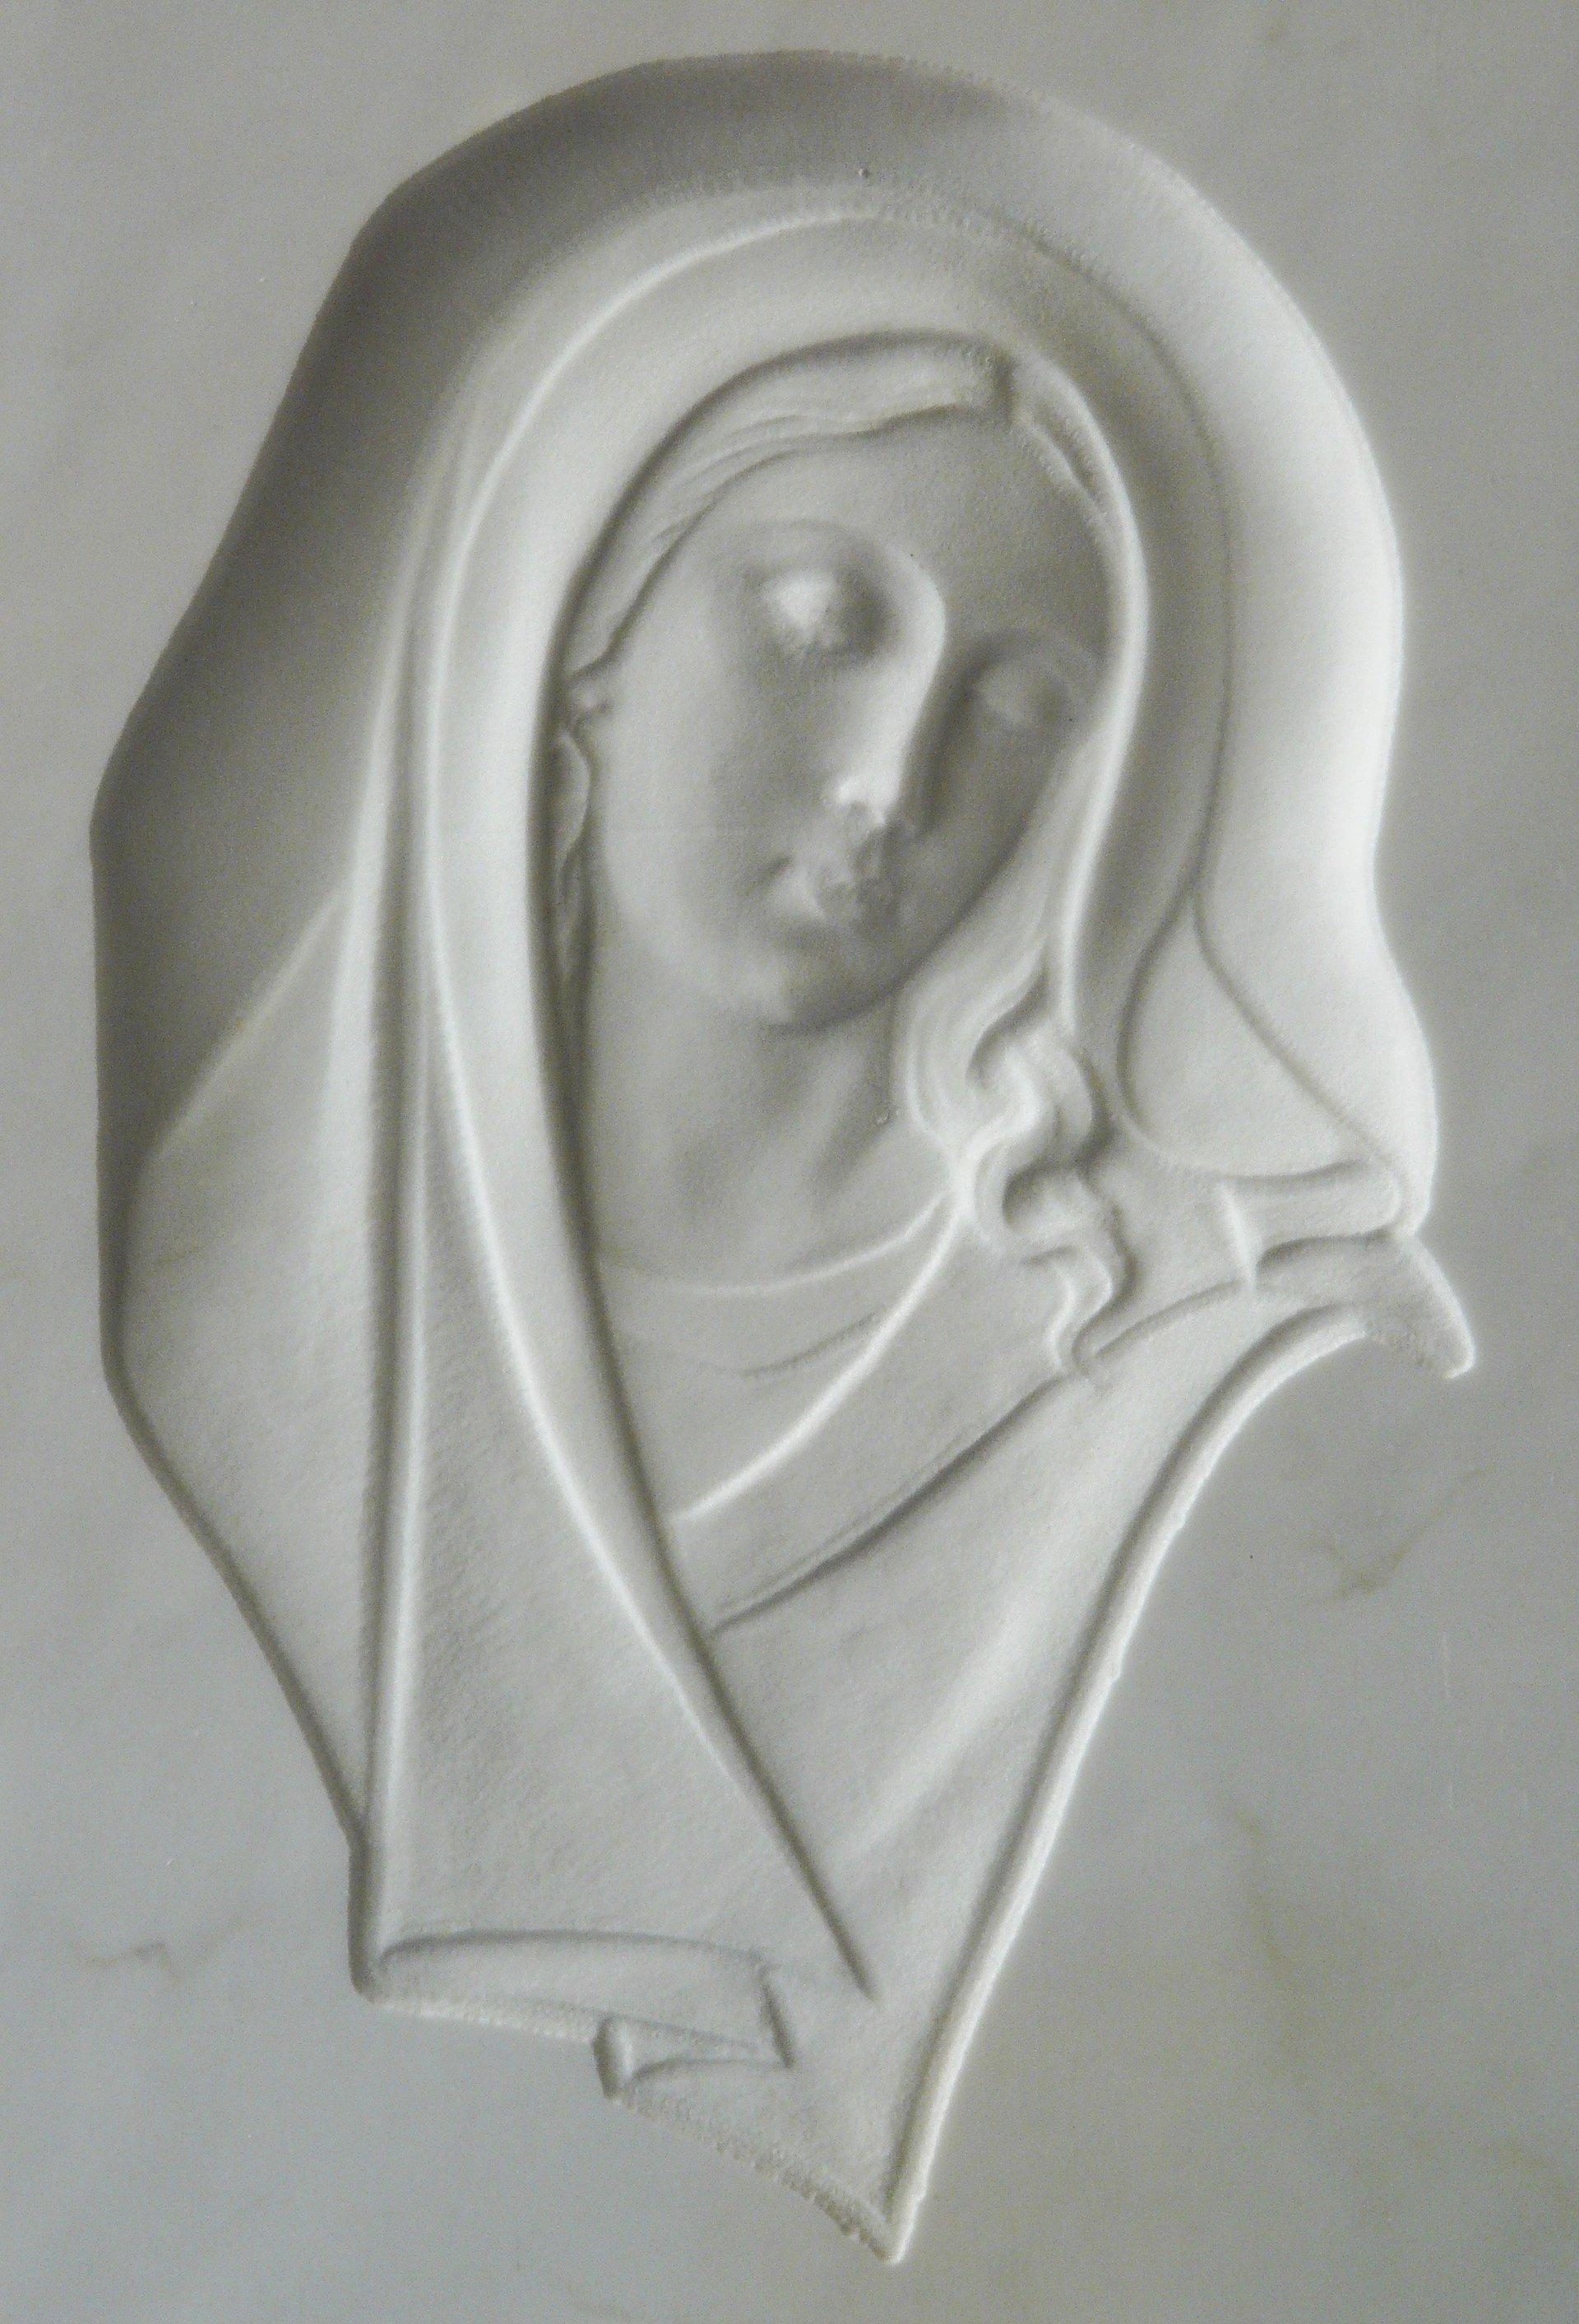 bassorielievo su marmo bianco con madonna